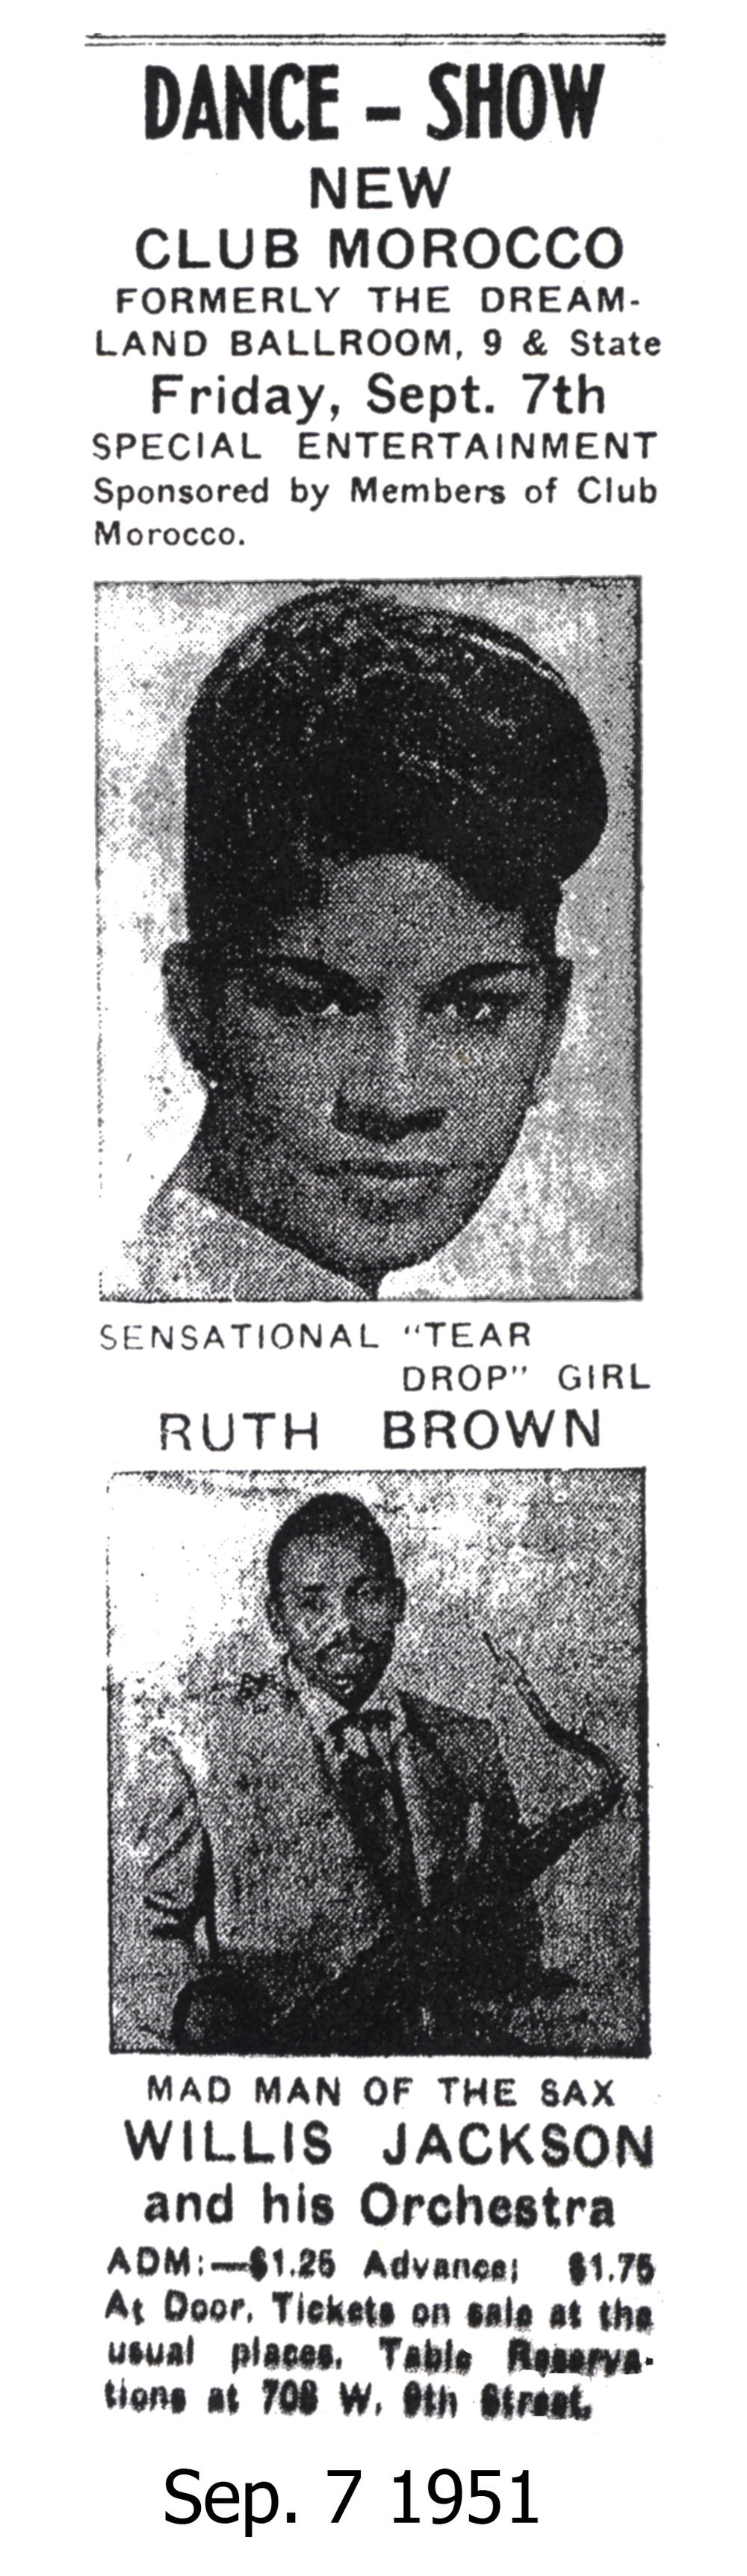 RuthBrown.jpg